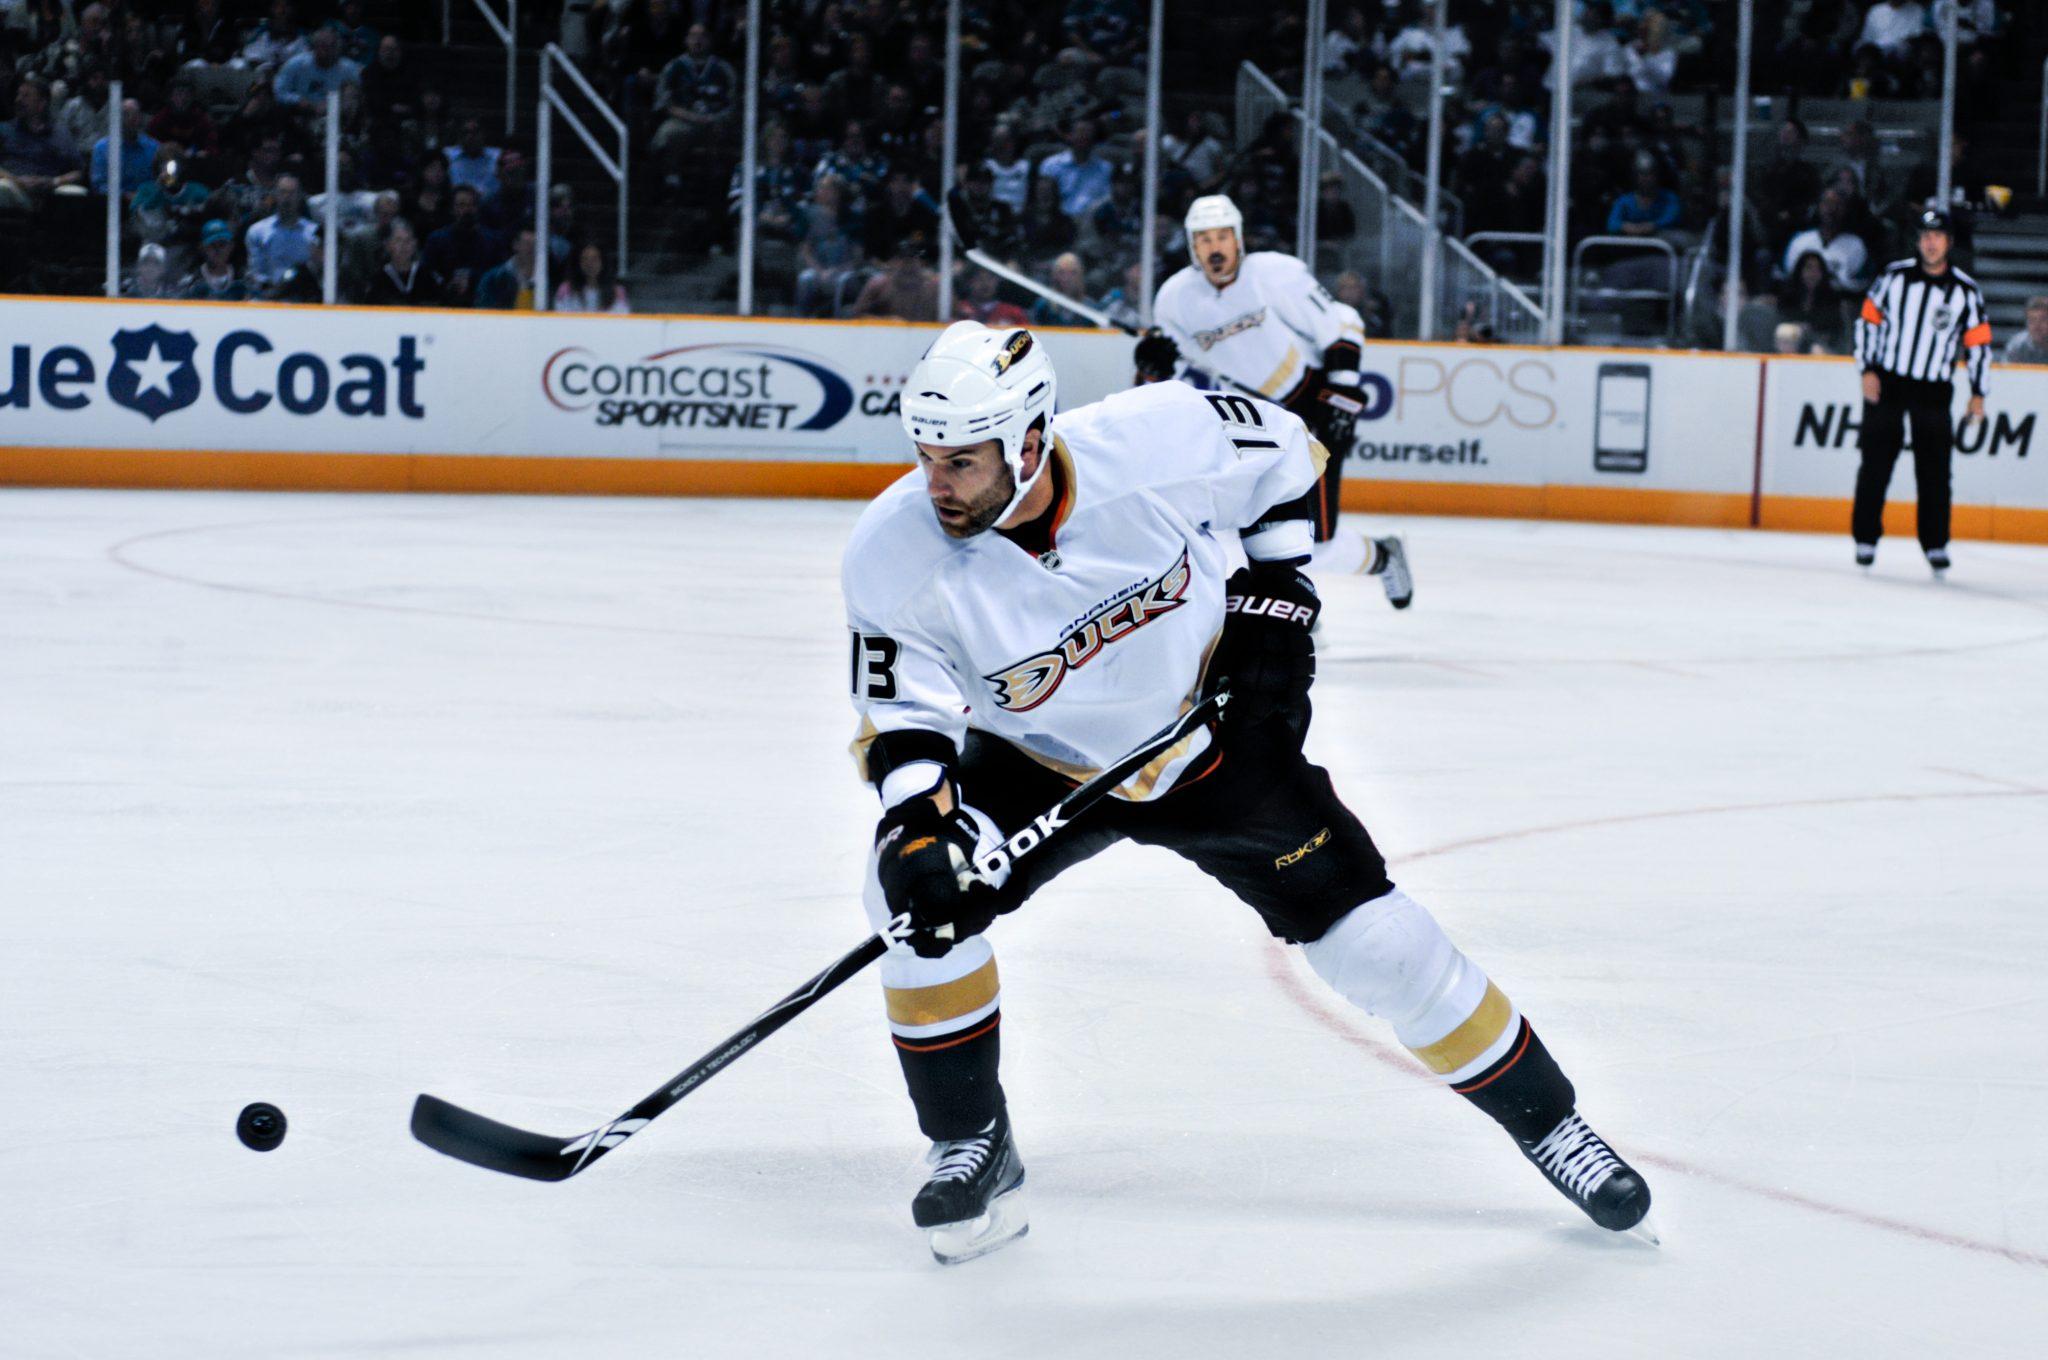 Joe Pacifico - Ice Hockey